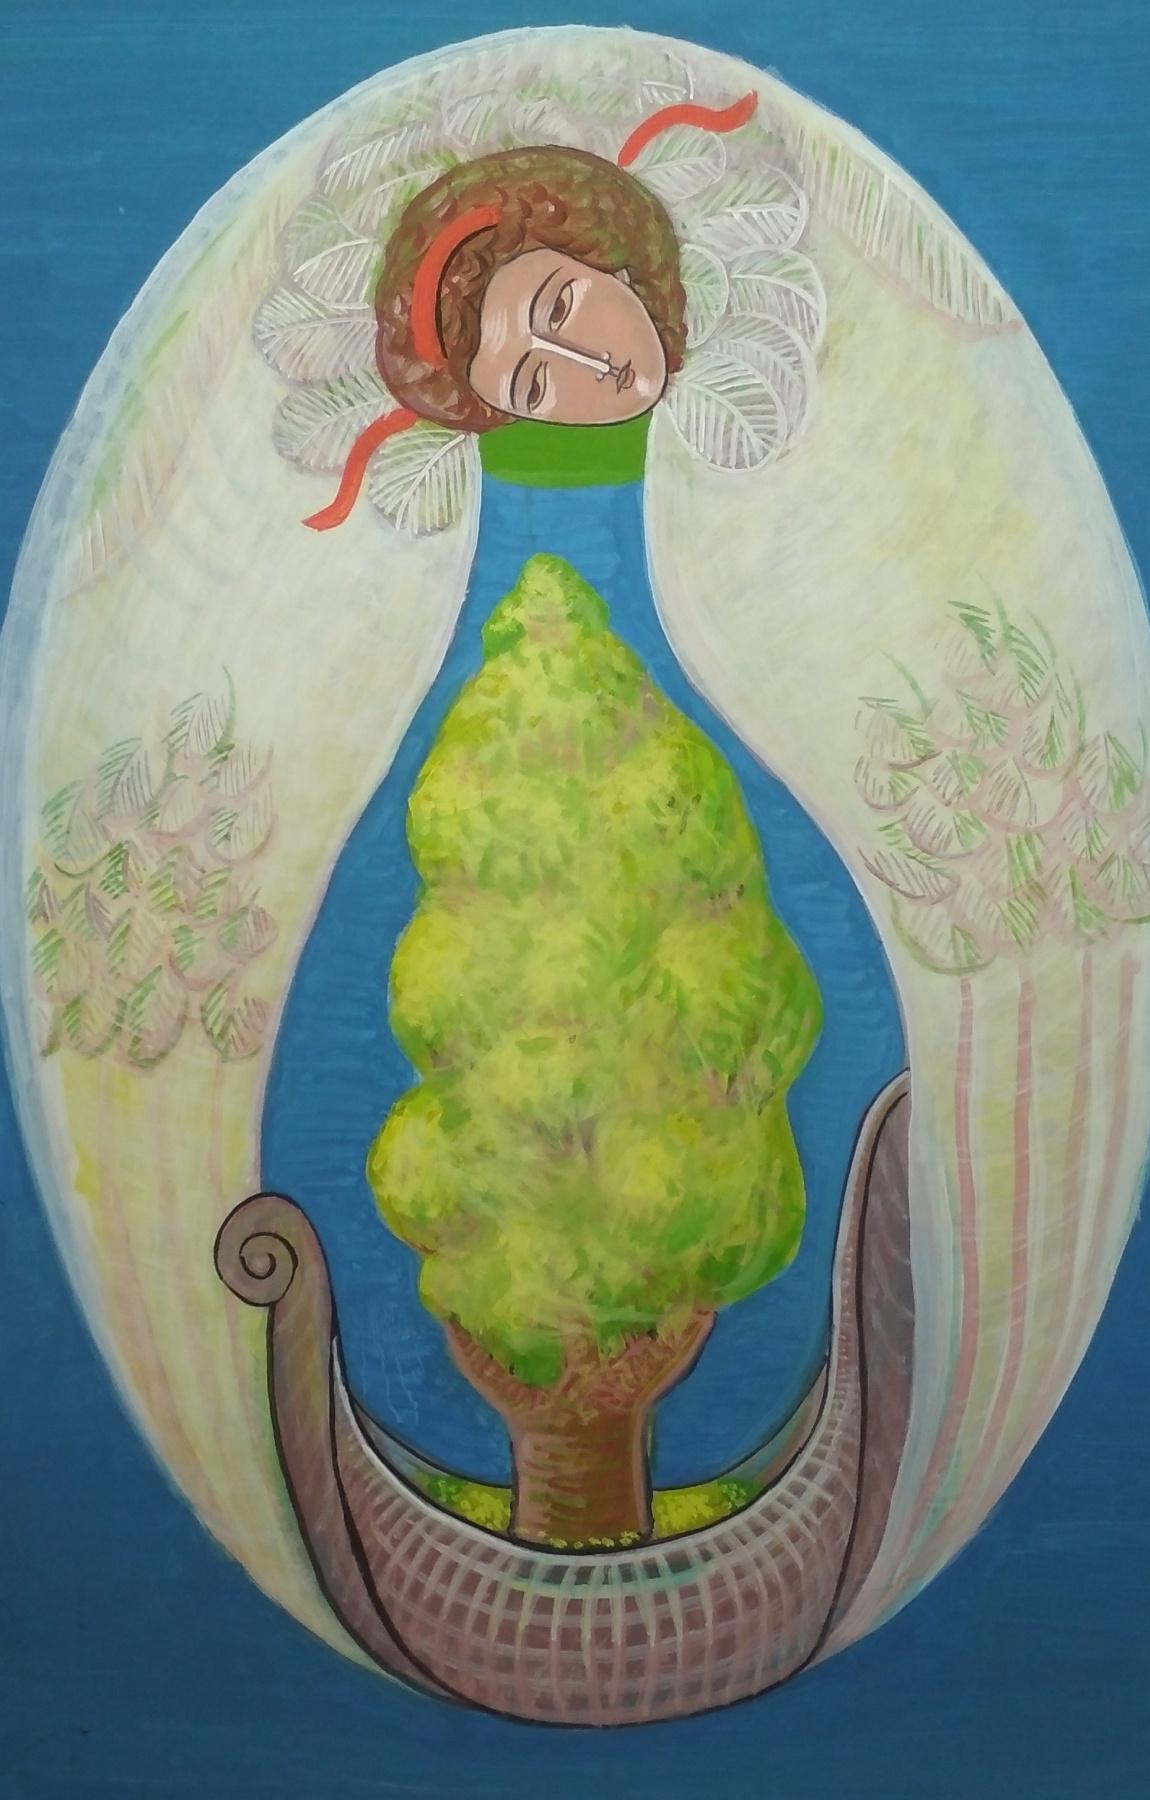 Rostislav Nikolaevich Ivanov. Angel with the Ark of the Seasons - Spring